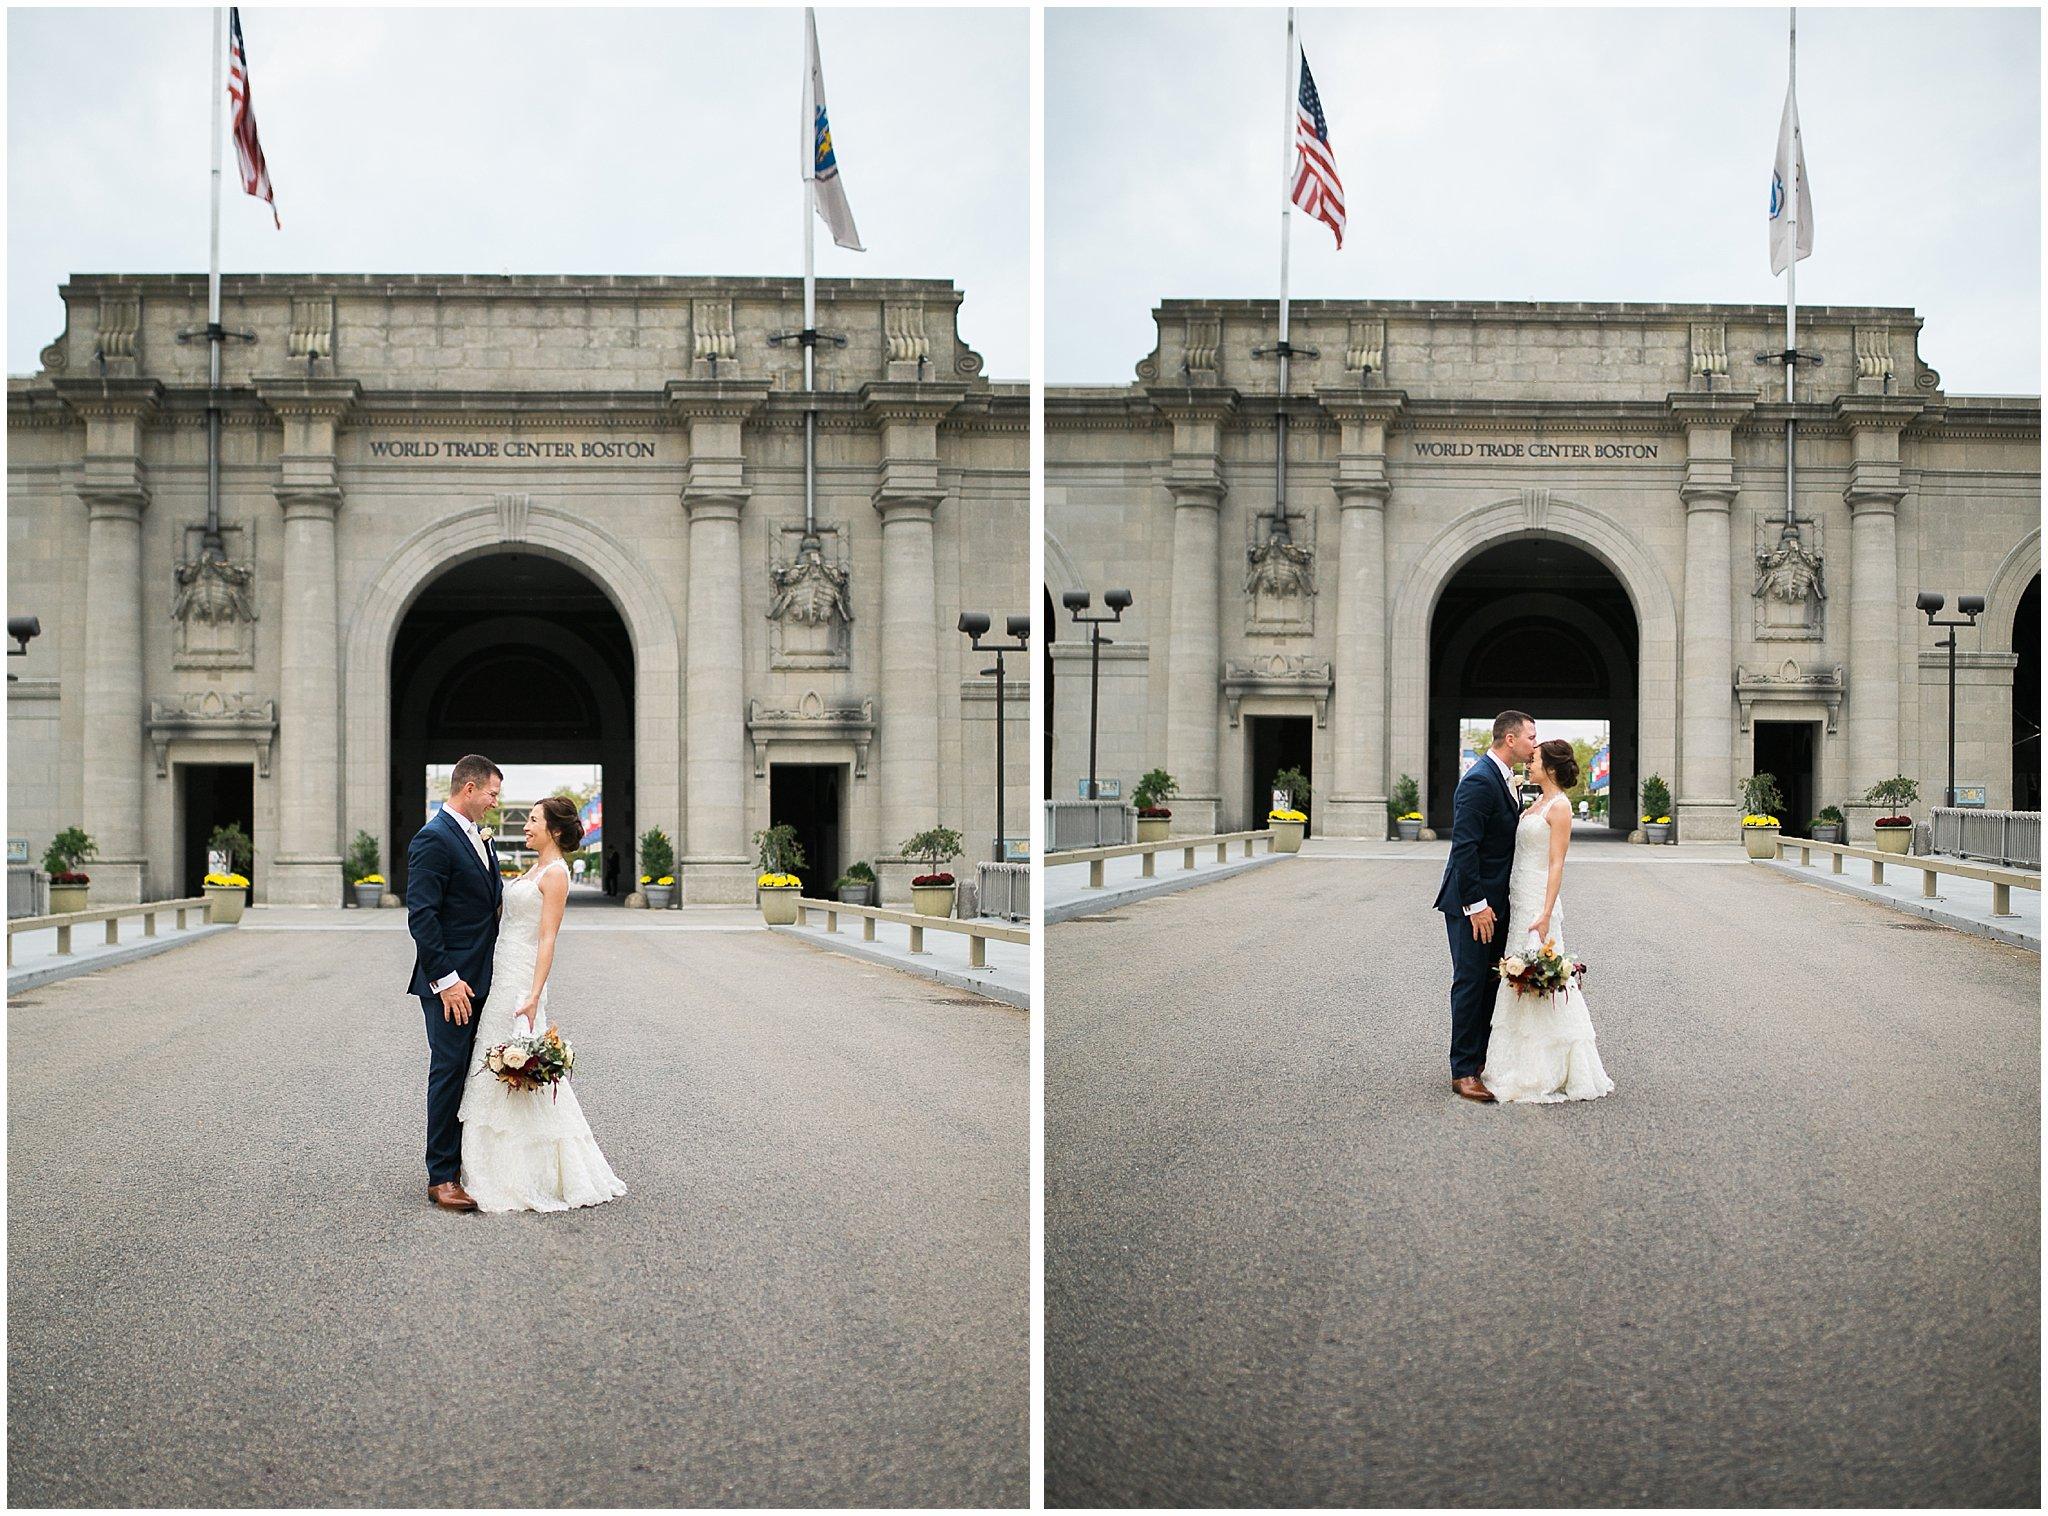 Seaport Hotel Wedding Boston Photographer Sweet Alice51.jpg